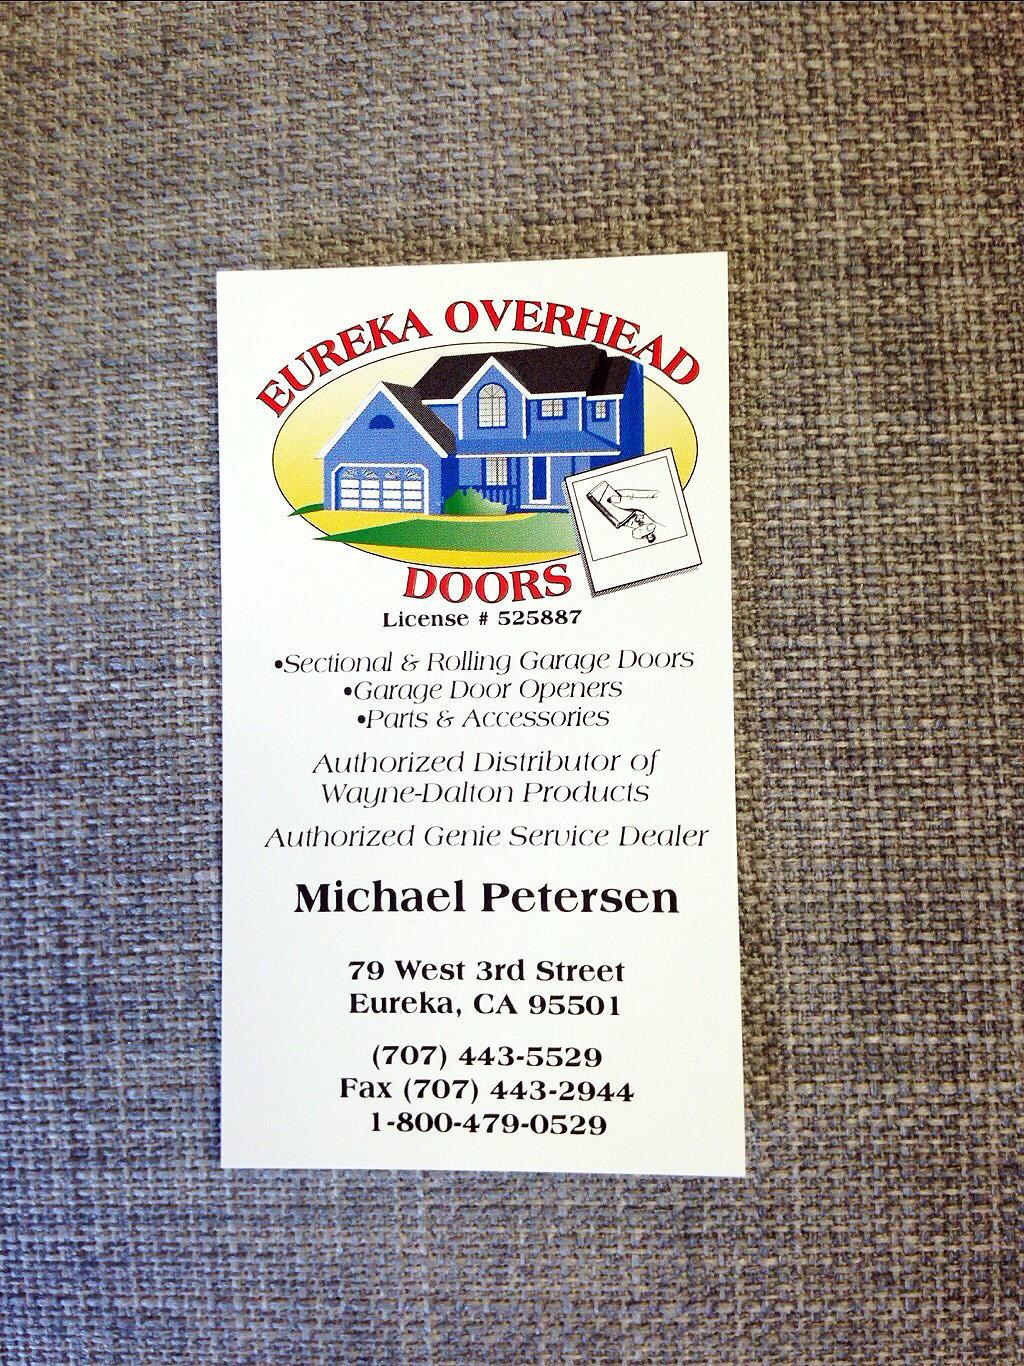 Eureka Overhead Door Company Inc. image 5